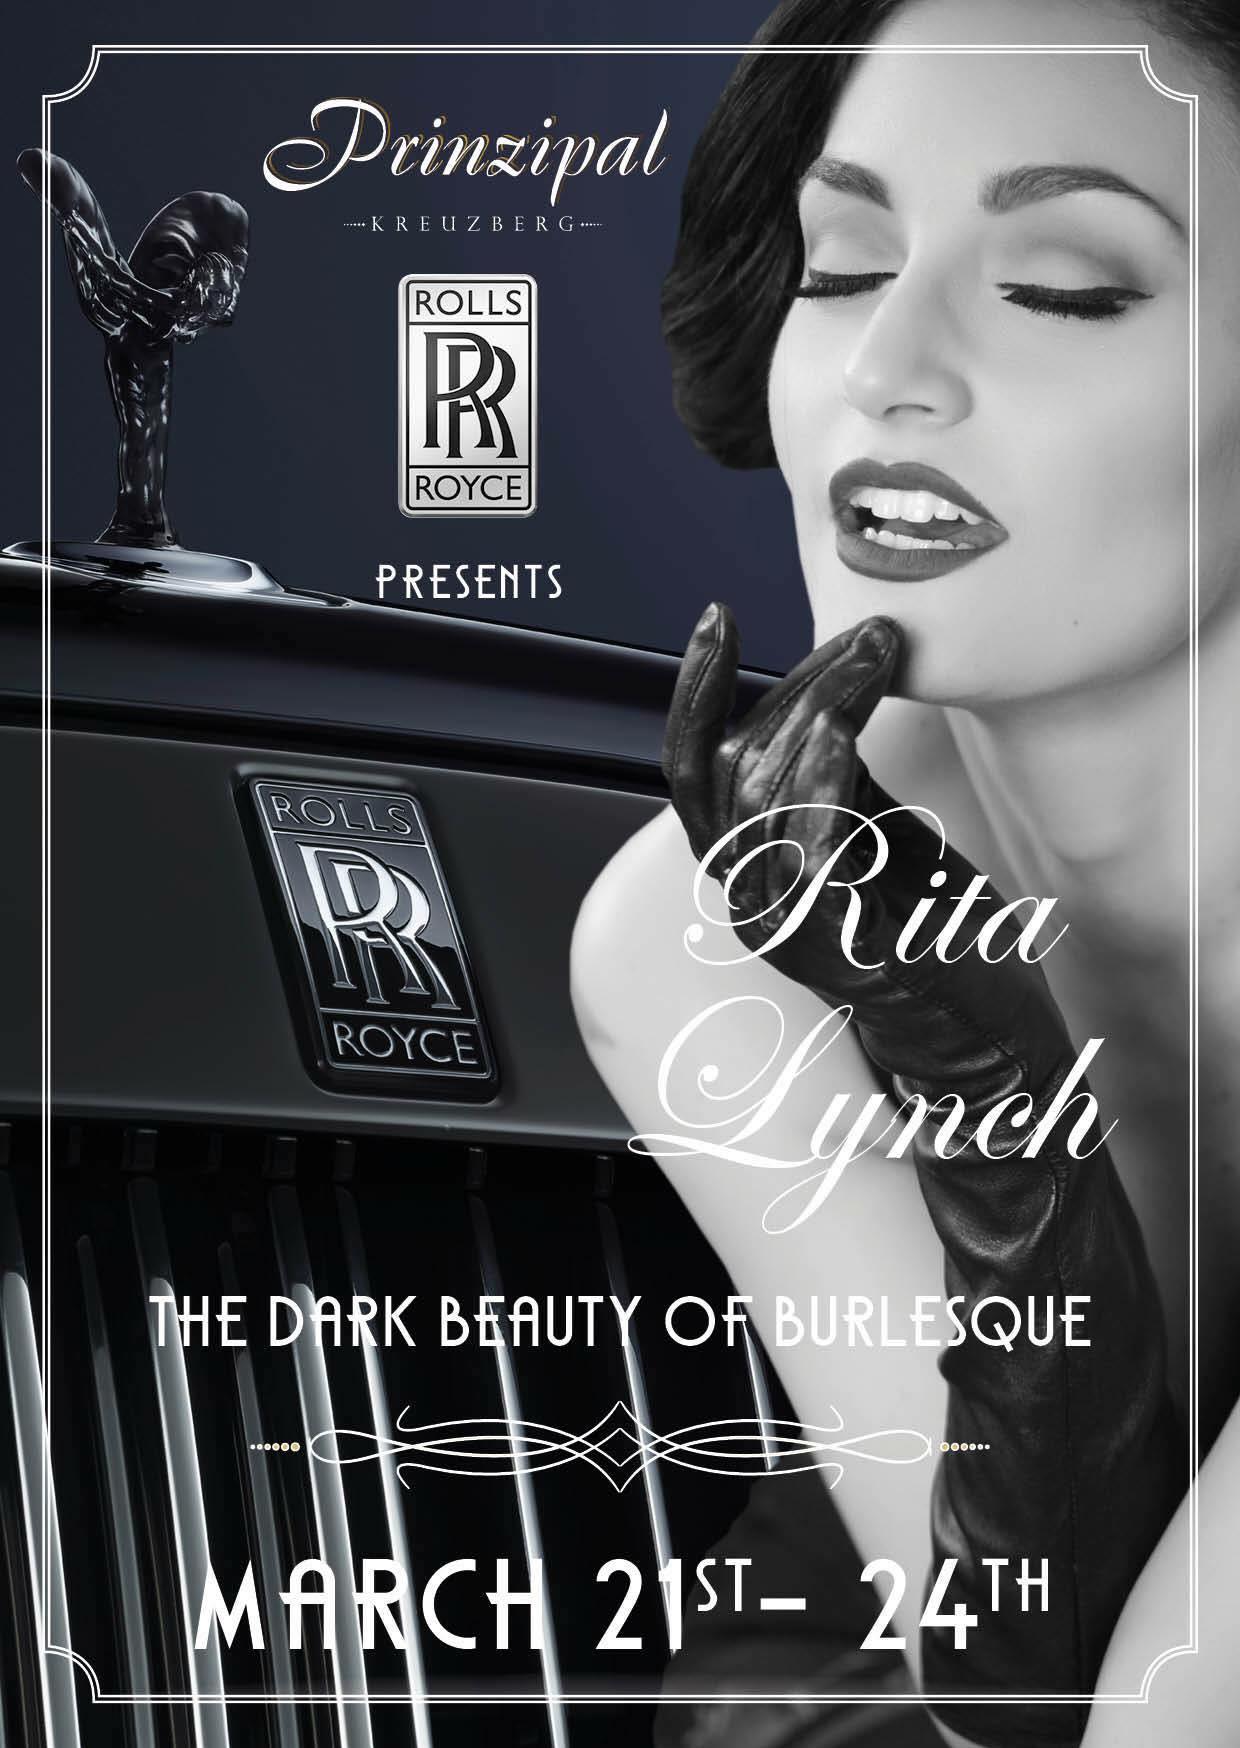 Rita Lynch - The Dark Beauty Of Burlesque